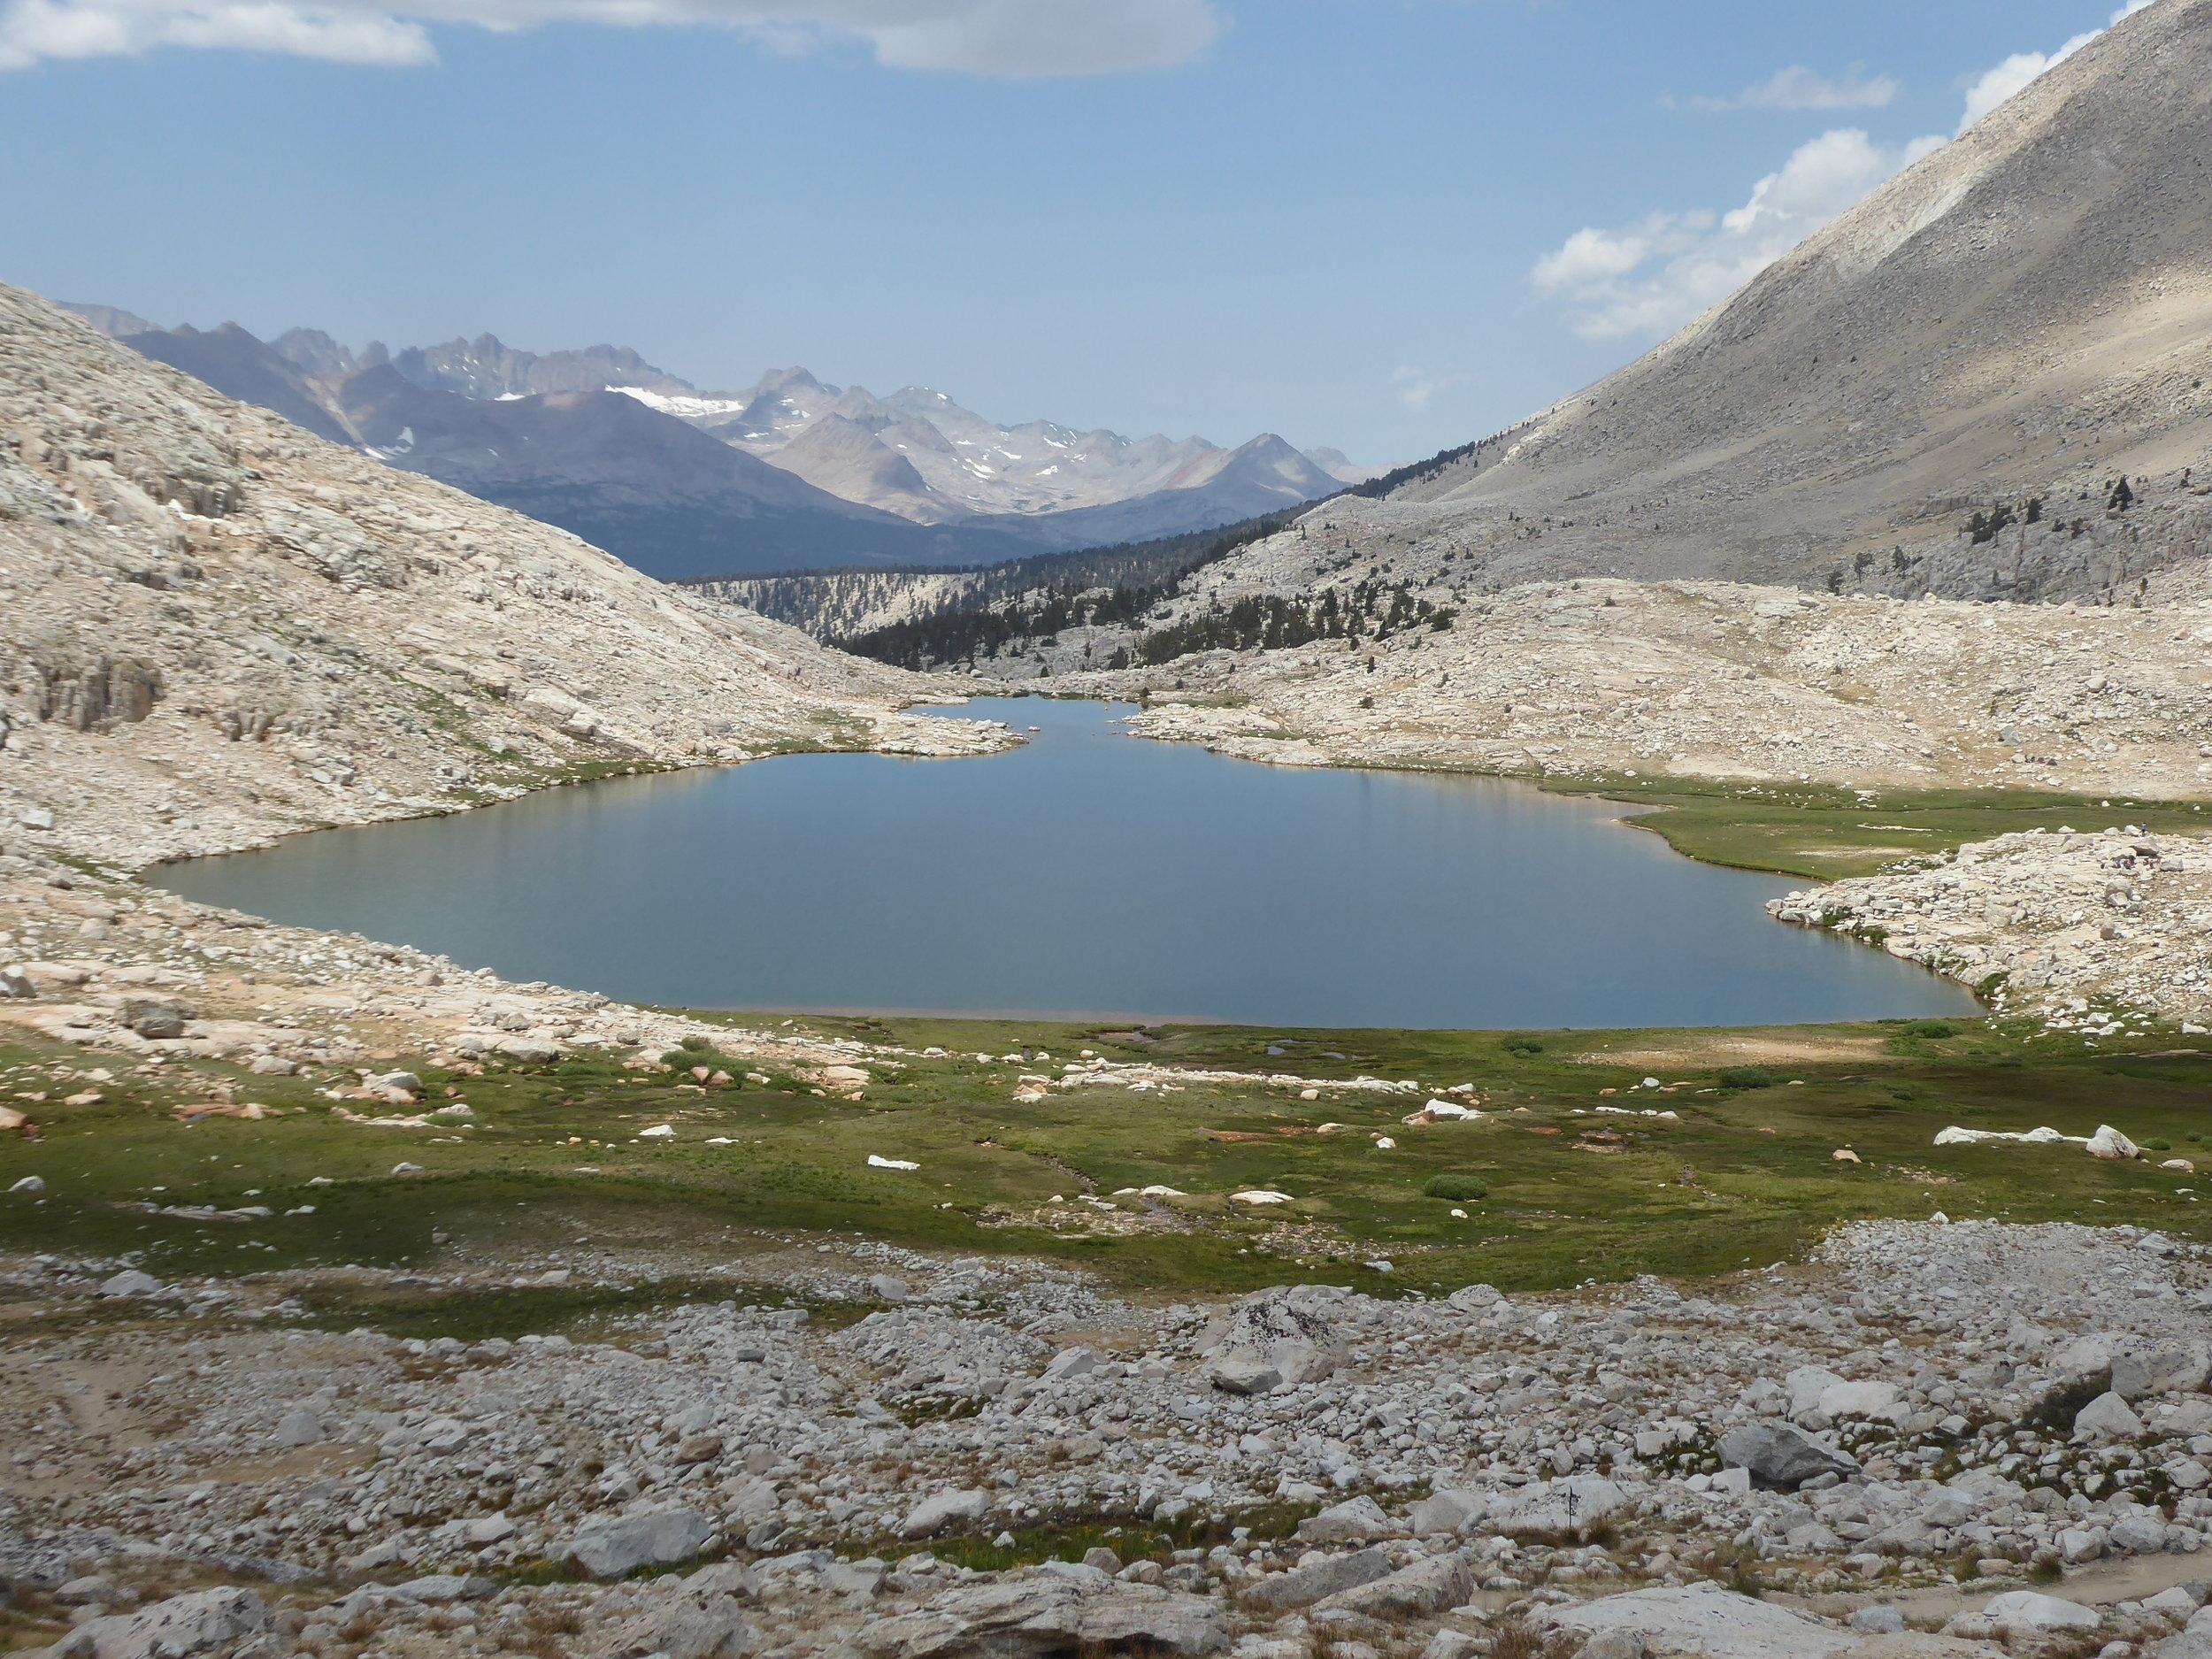 This lake has the obvious name of Guitar Lake.